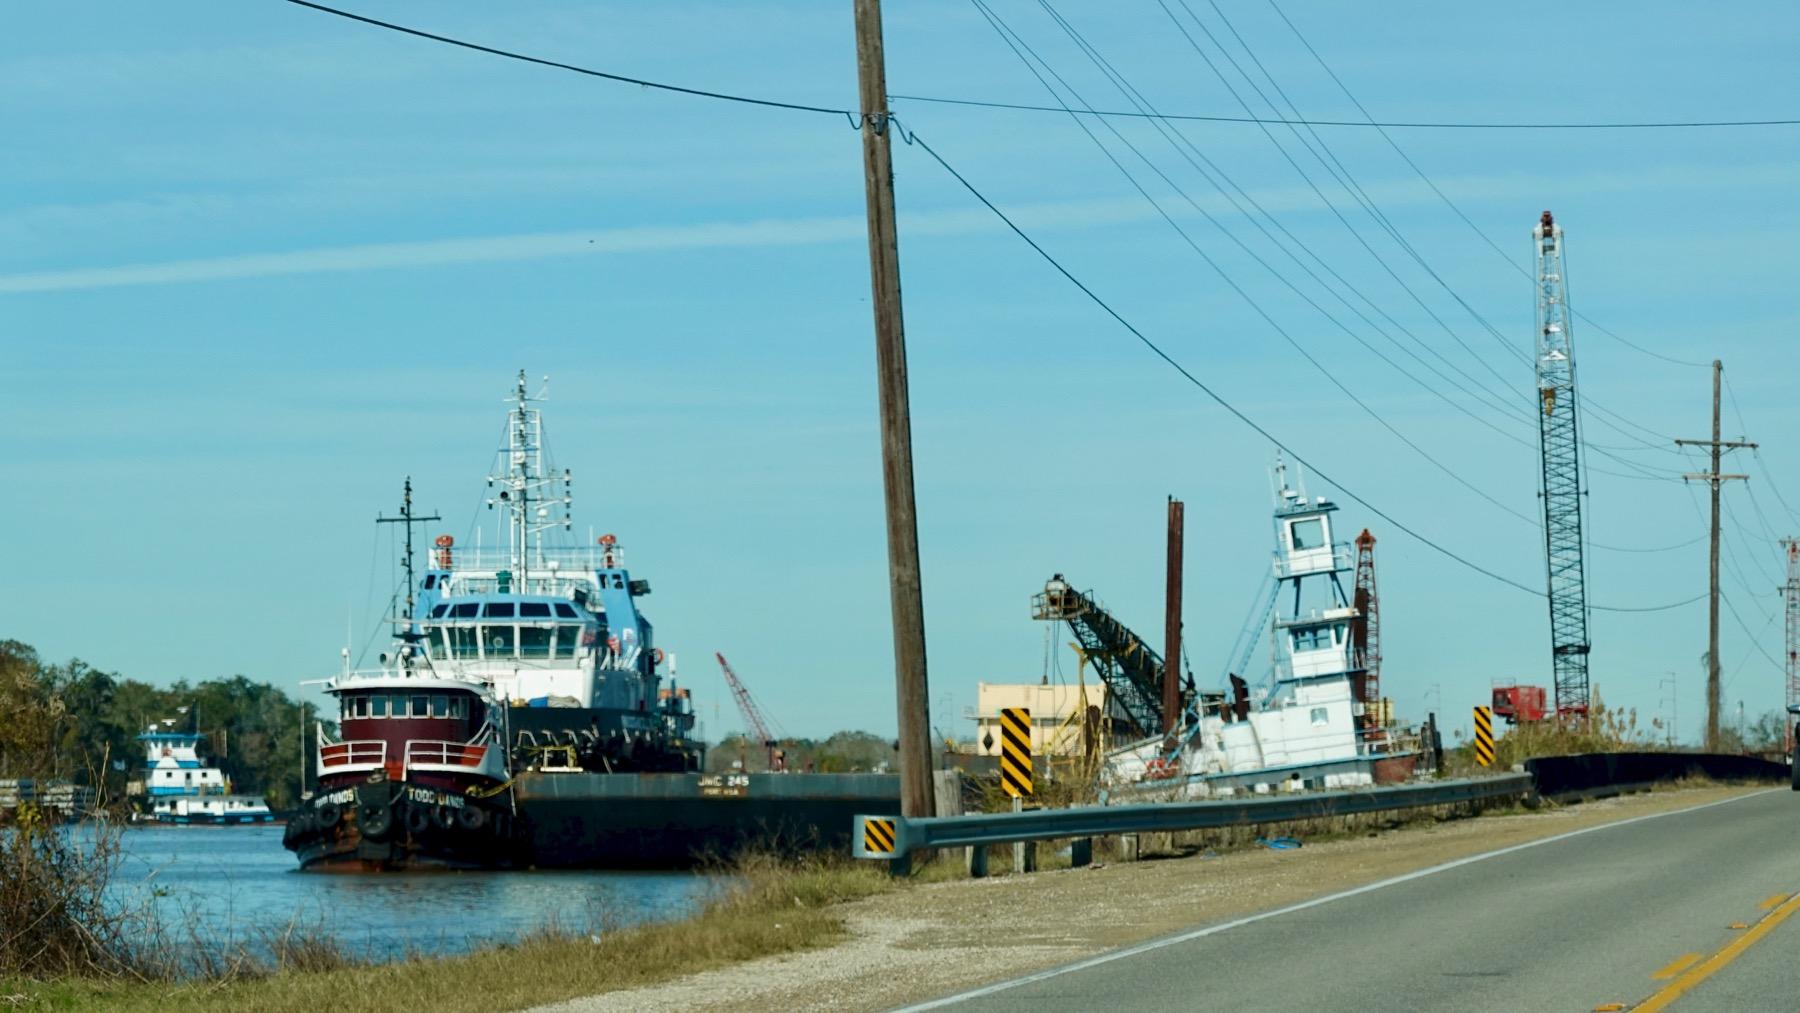 Roadside shipbuilding